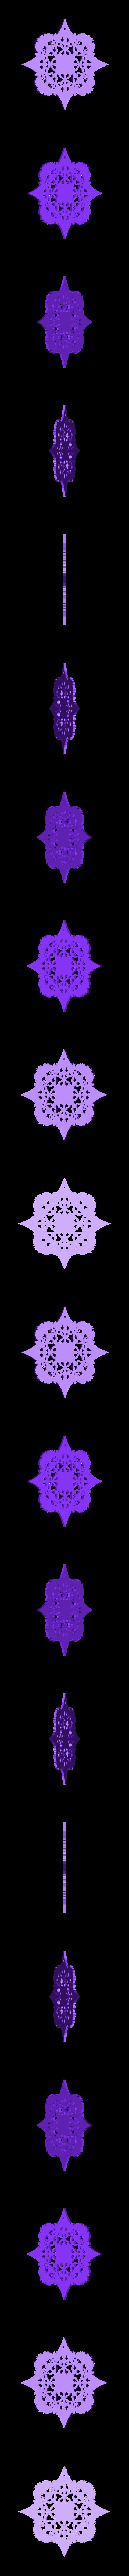 GothicSnowflake2.STL Download free STL file Gothic Snowflakes • 3D printer template, PortoCruz675